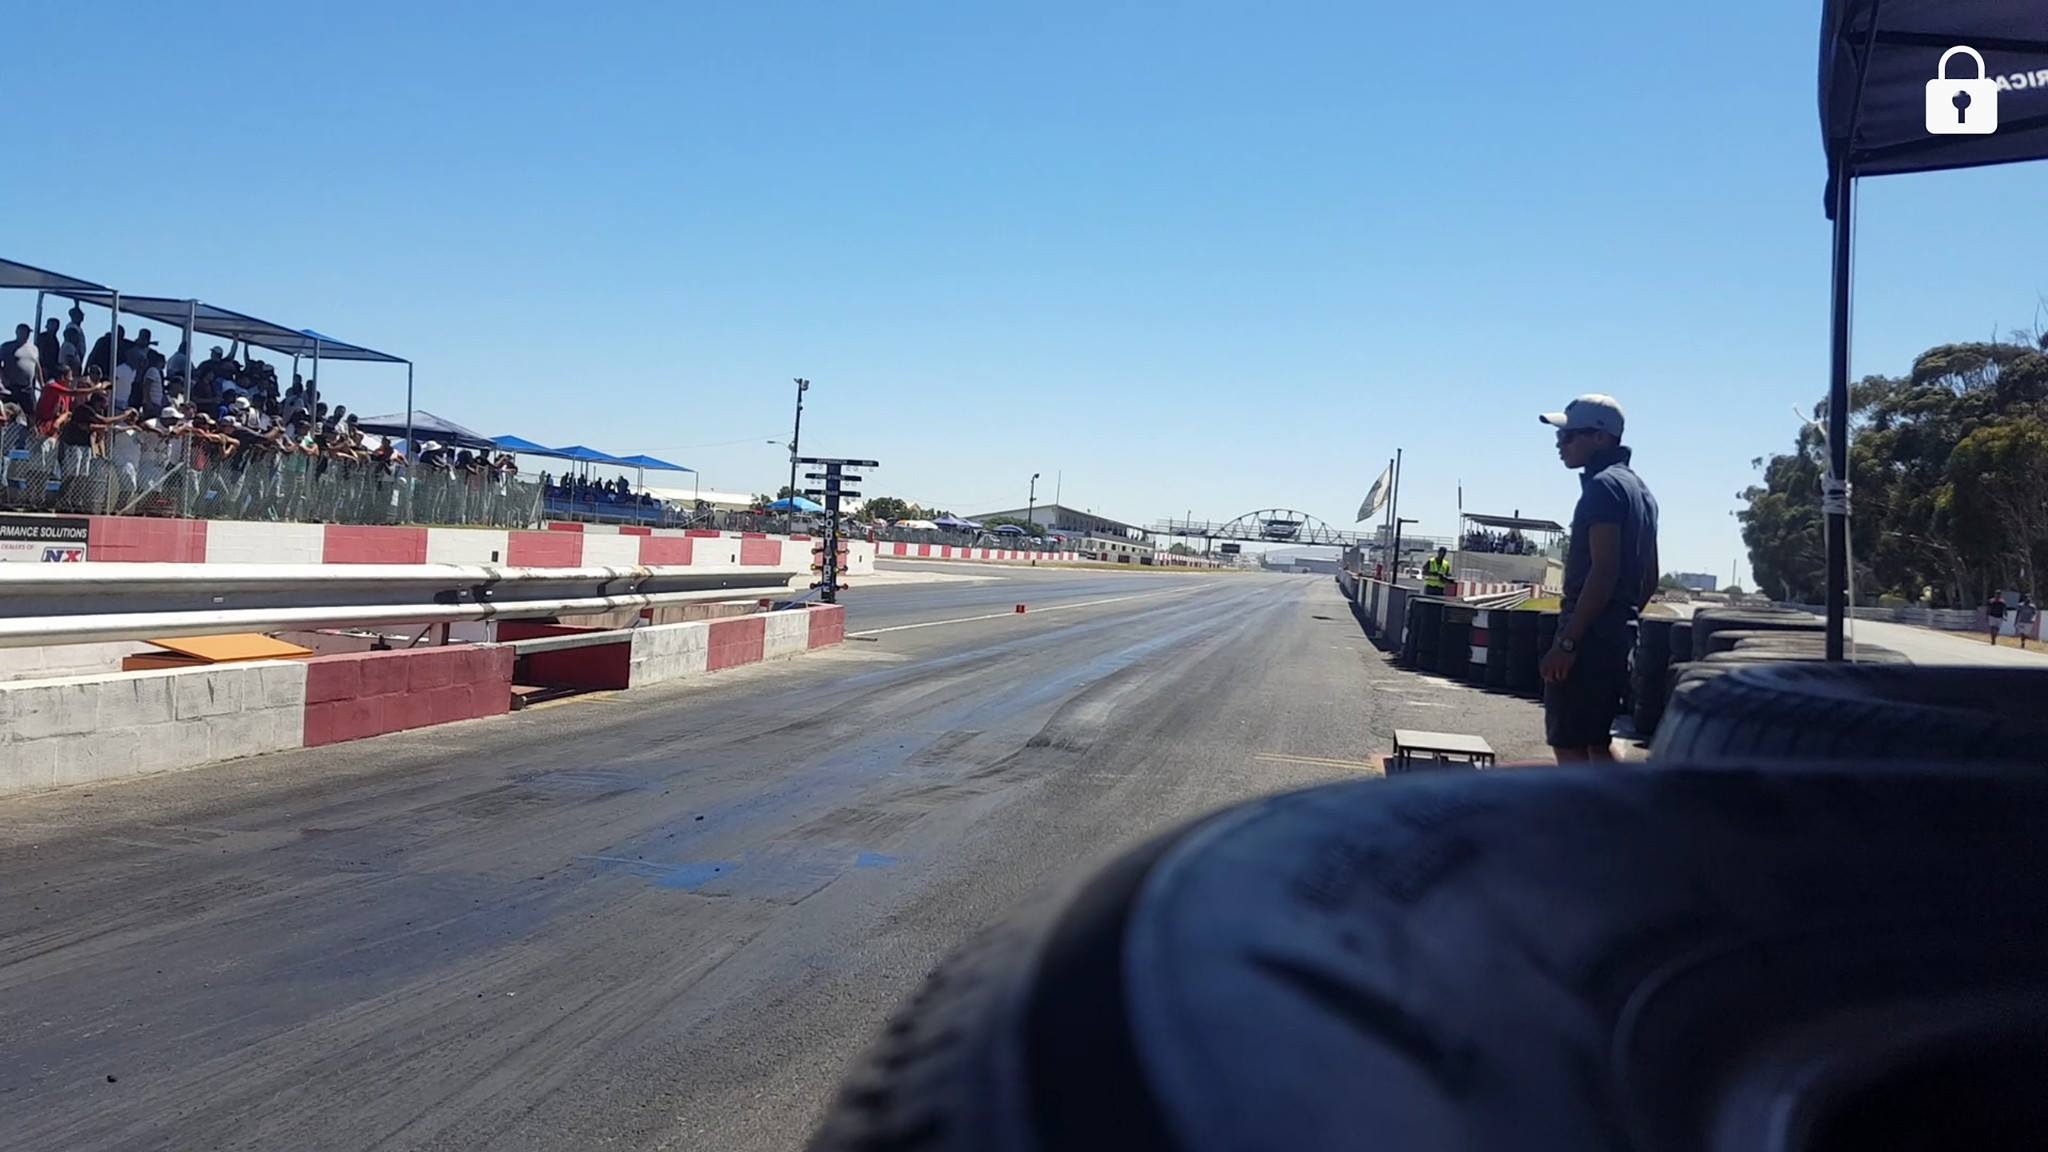 Dra Racing dating